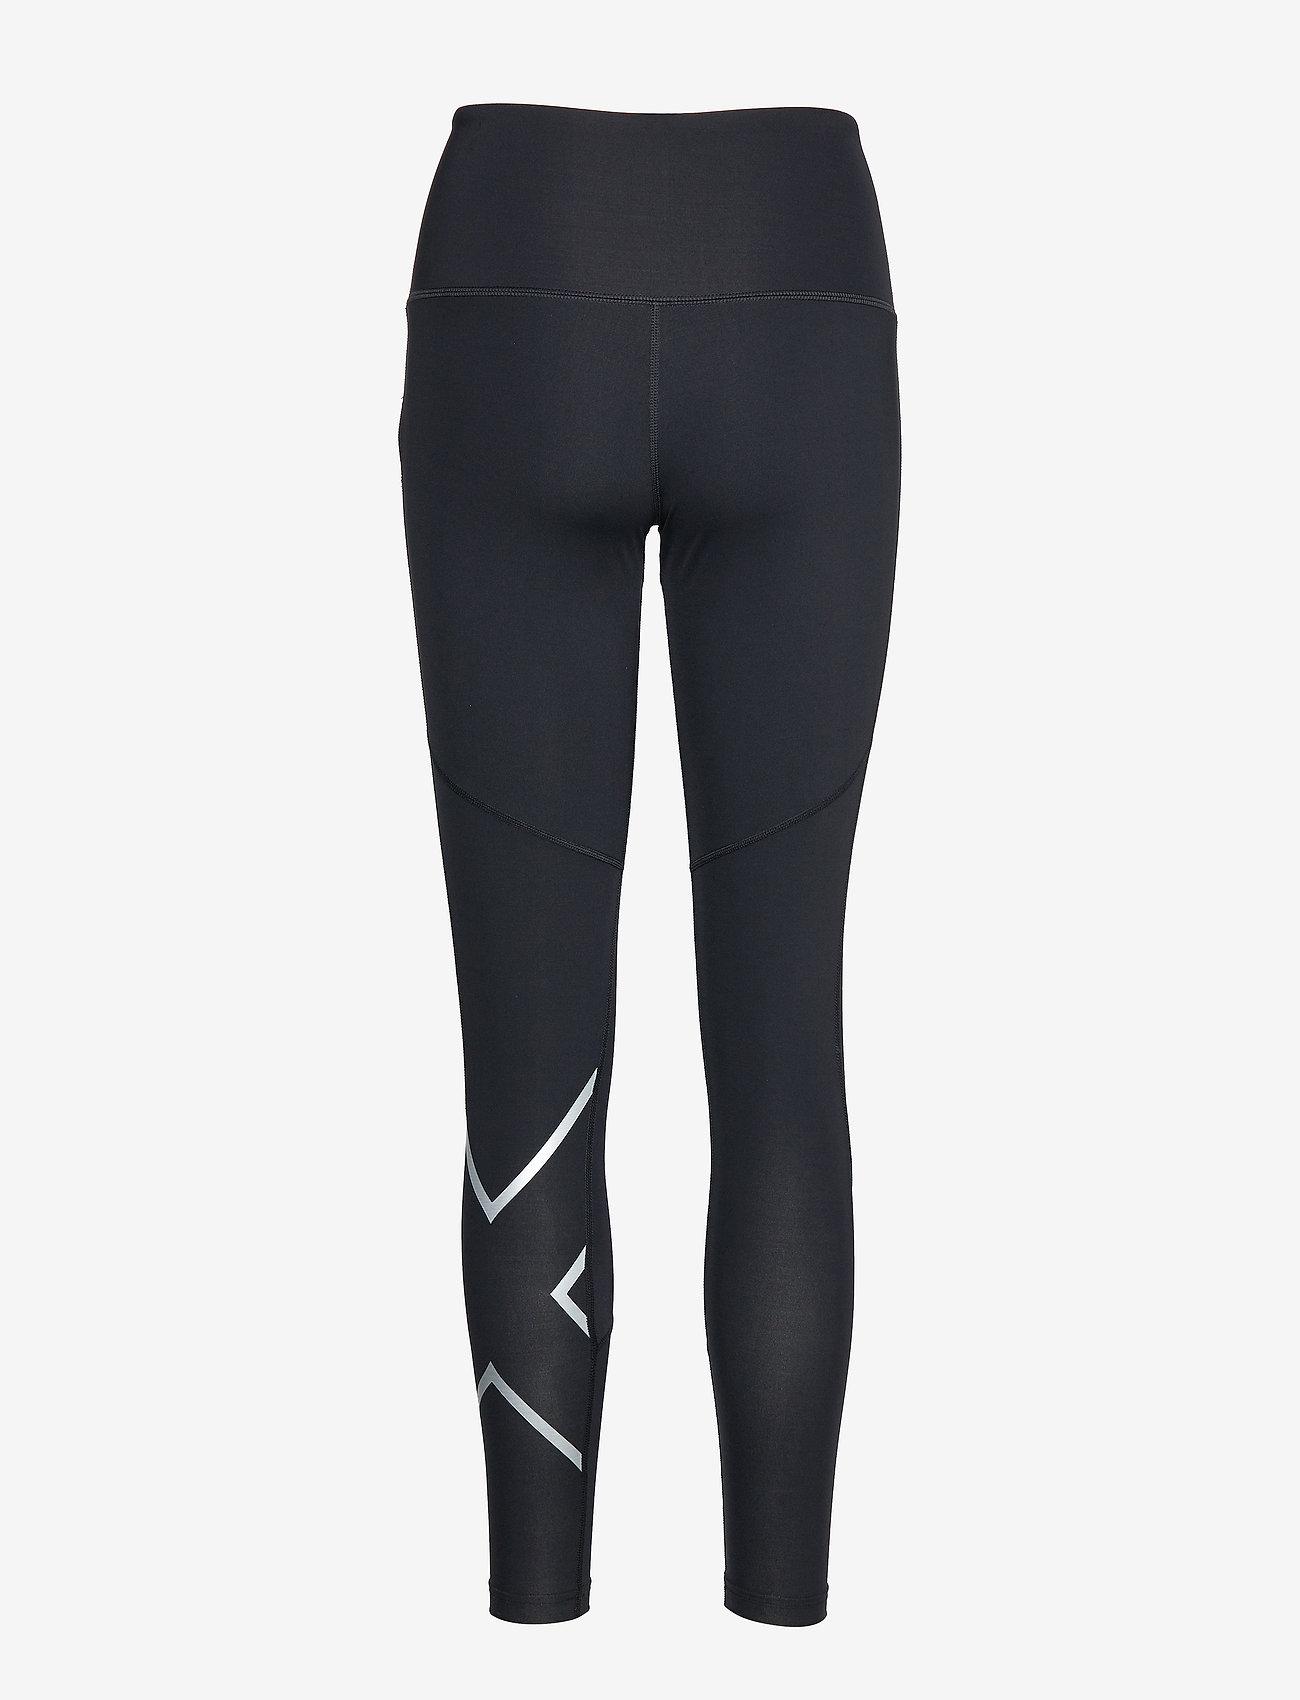 2XU - MOTION HI-RISE COMPRESSION TI - sportleggings - black/silver x logo - 1